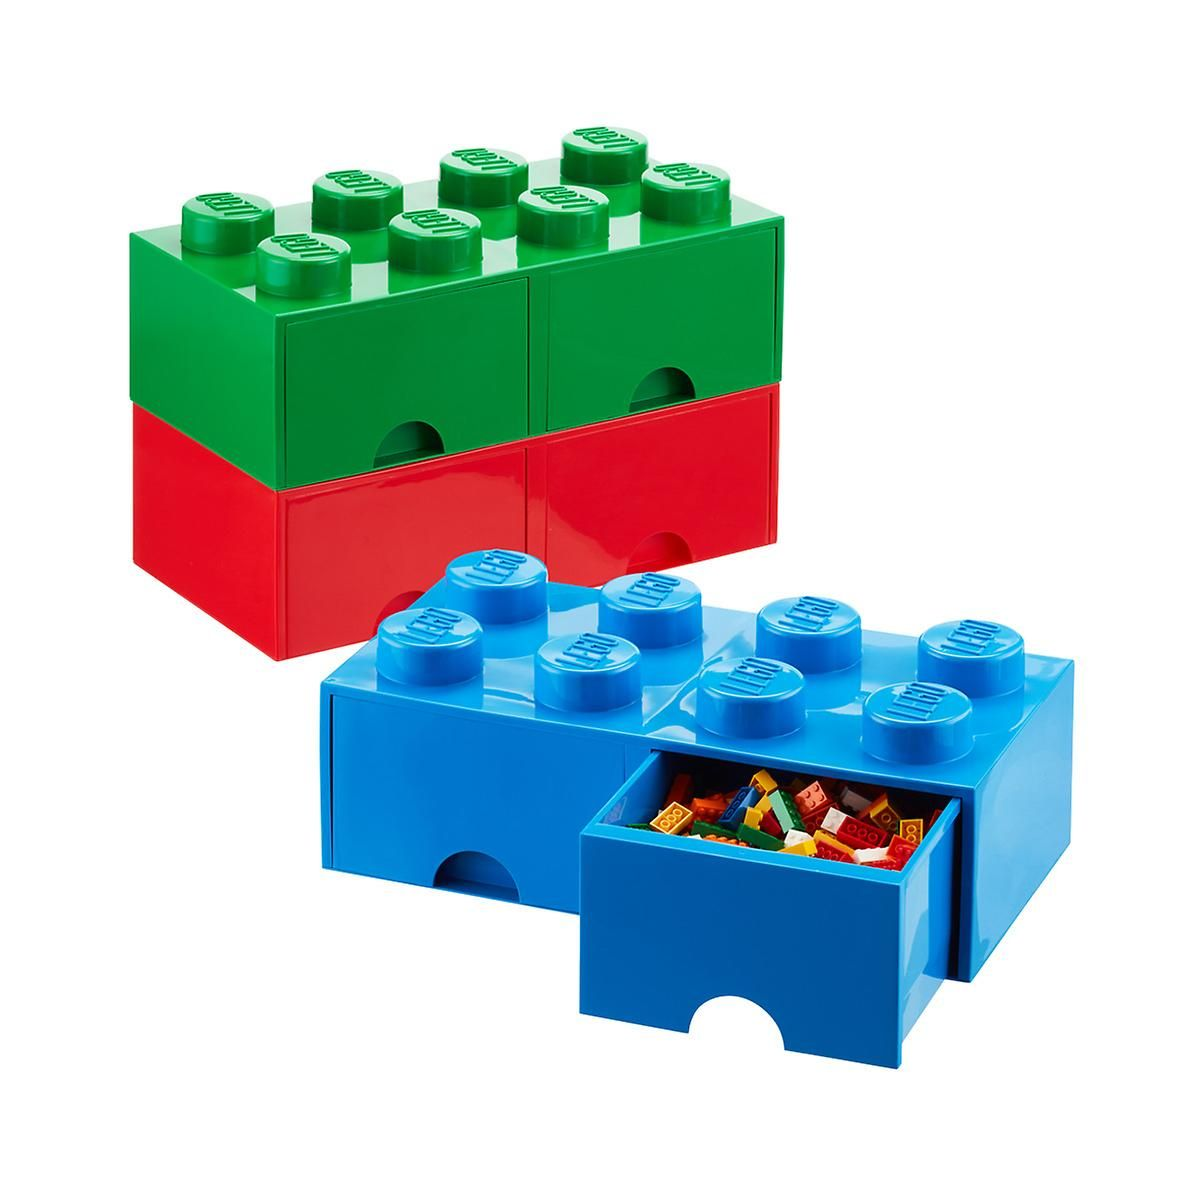 LEGO STORAGE BRICK 1 GREEN CHILDRENS TOYS STORAGE CONTAINER NEW